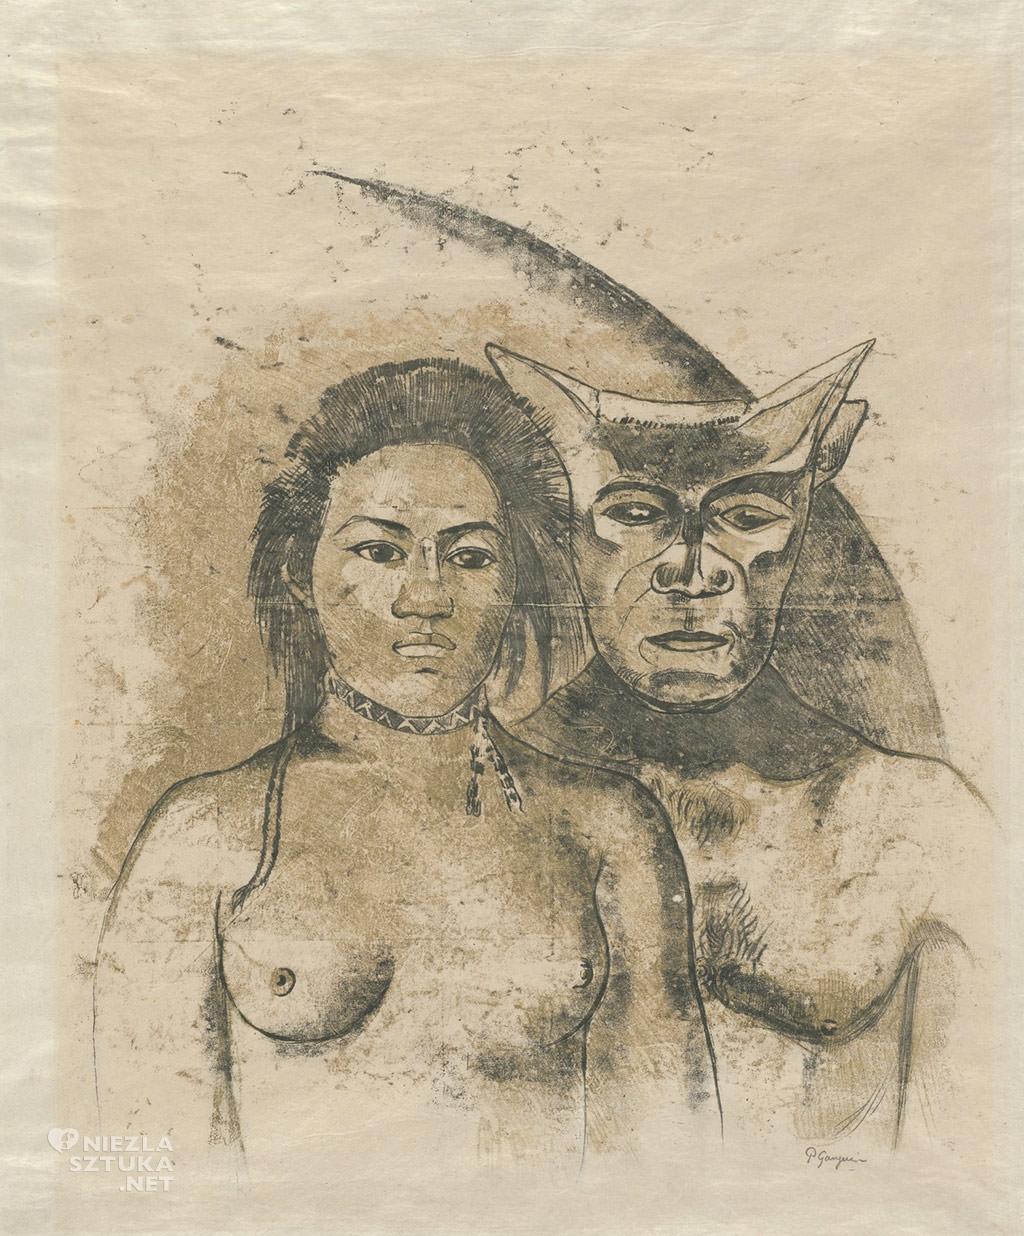 Paul Gauguin, Tahitańska kobieta ze złym duchem, szkic Gauguina, dziennik Noa Noa , postimpresjonizm, diabeł, zły duch, twórczość Gauguina na Thaiti, sztuka Thaiti, Niezła sztuka